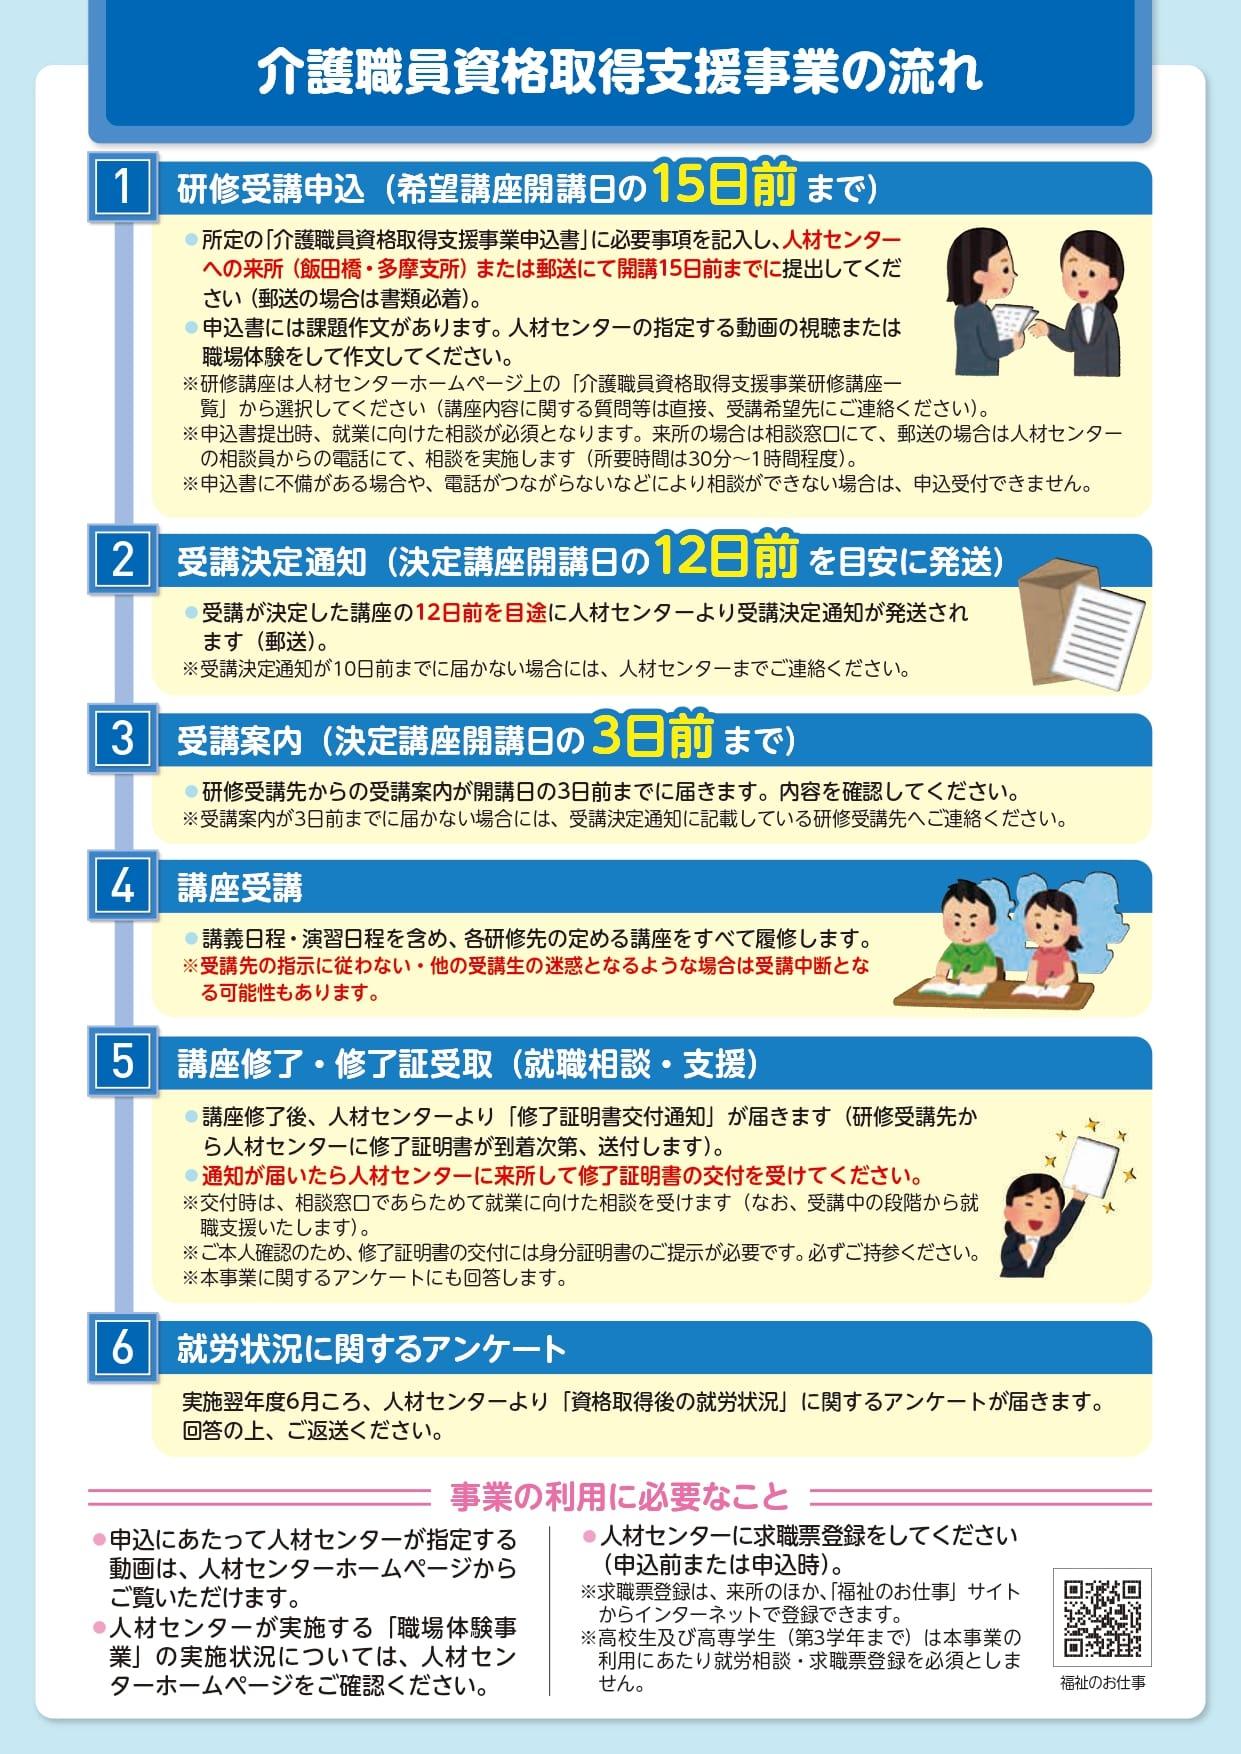 01kouhoutirasi-zenntai-2_compressed (1)_page-0001-min